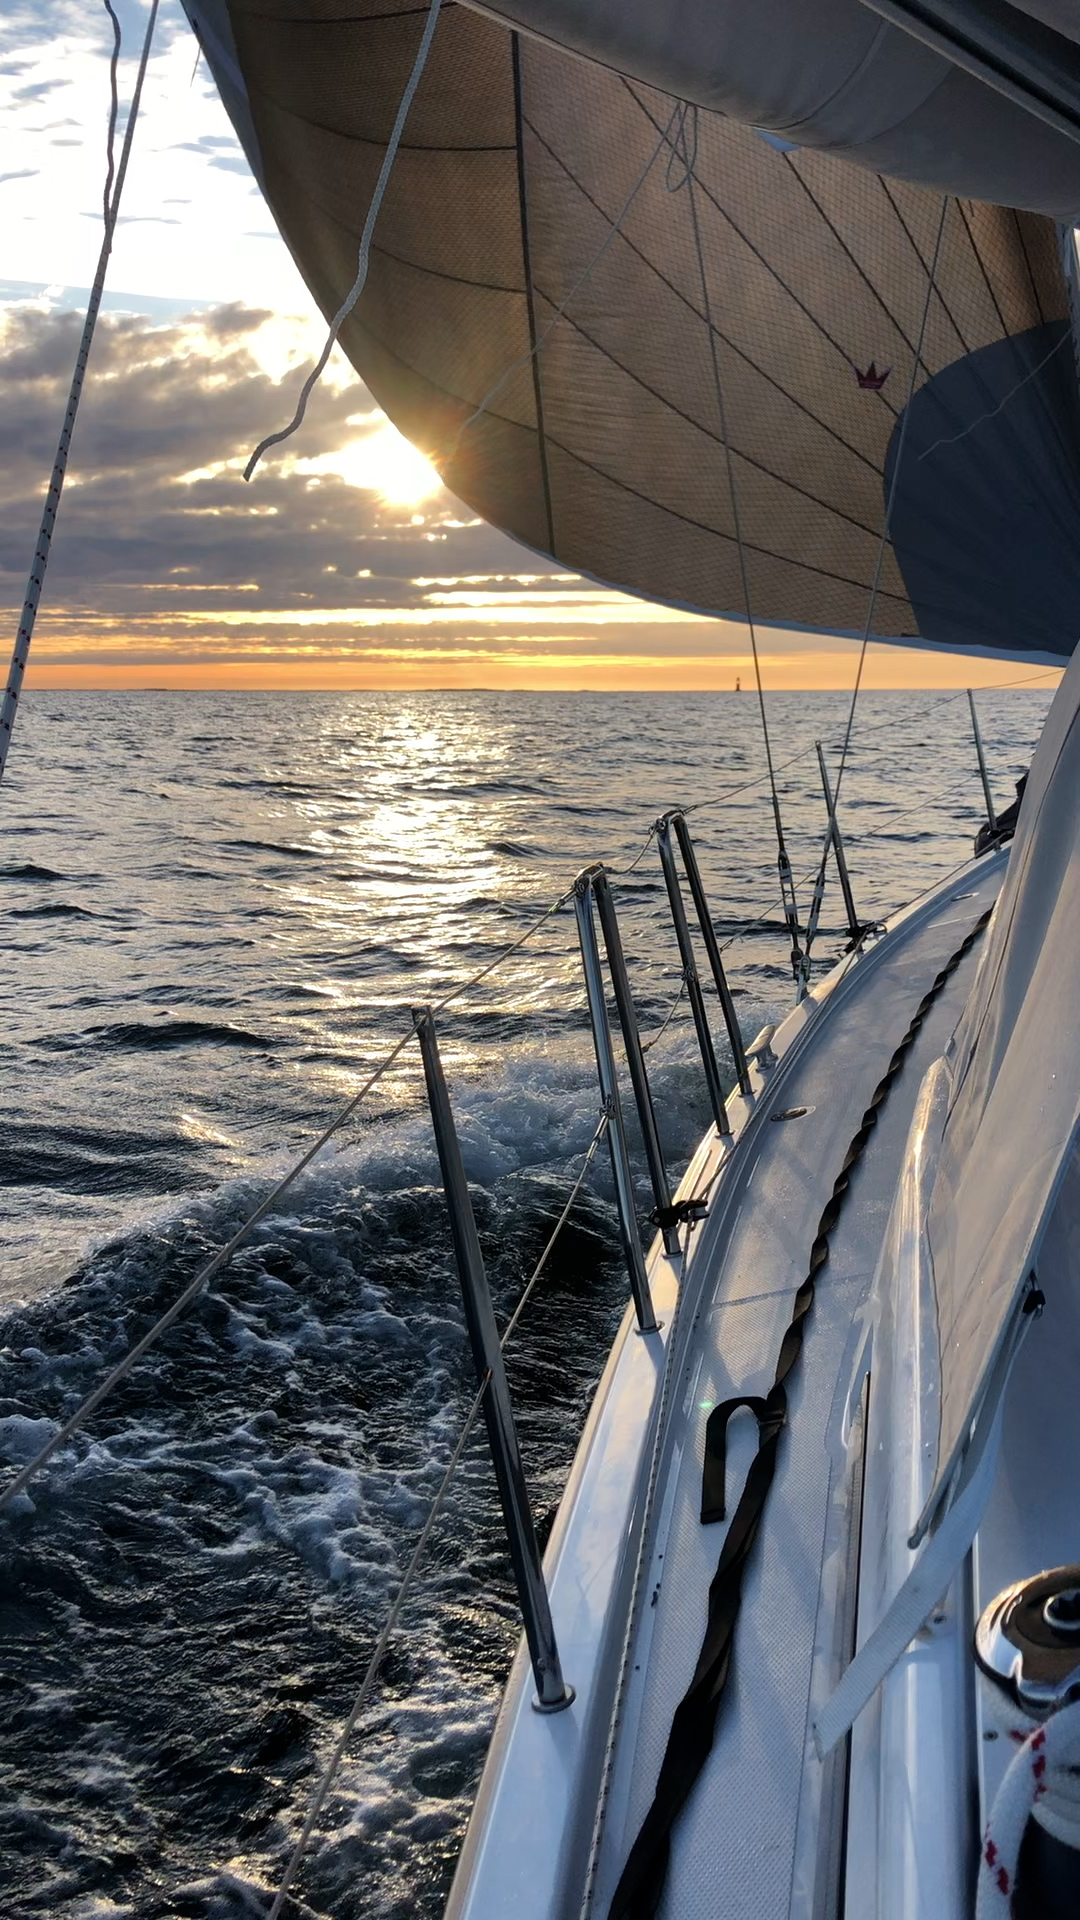 s/y Charlotte sailing downwind, sunrise